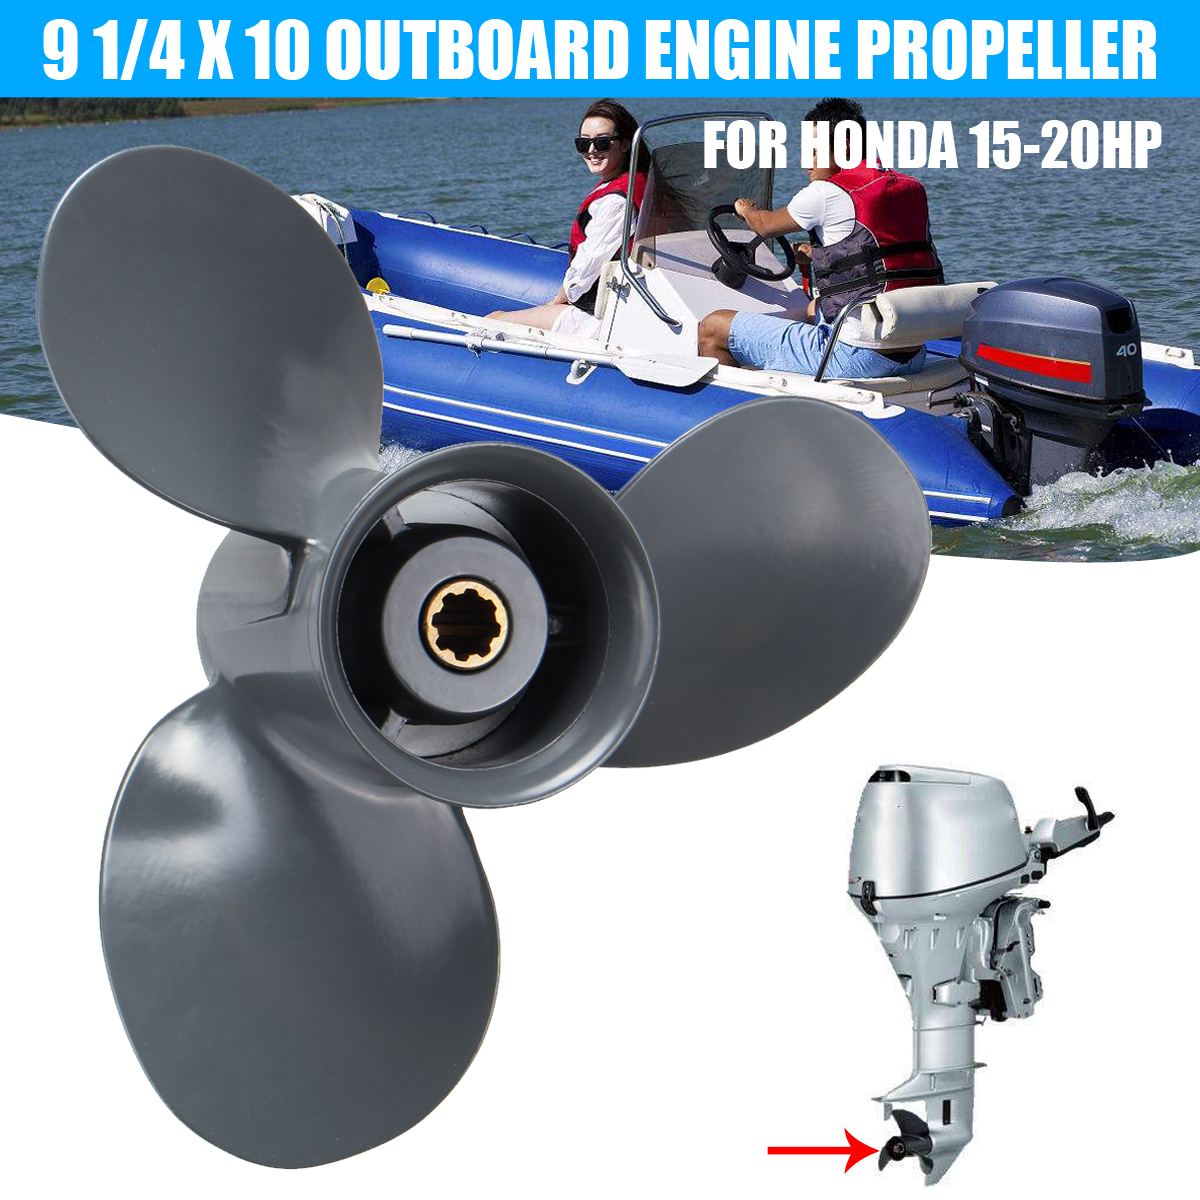 Audew Marine Boat Engine Propeller 9 1/4 X 10 Outboard Engine Propeller For Honda 15-20HP